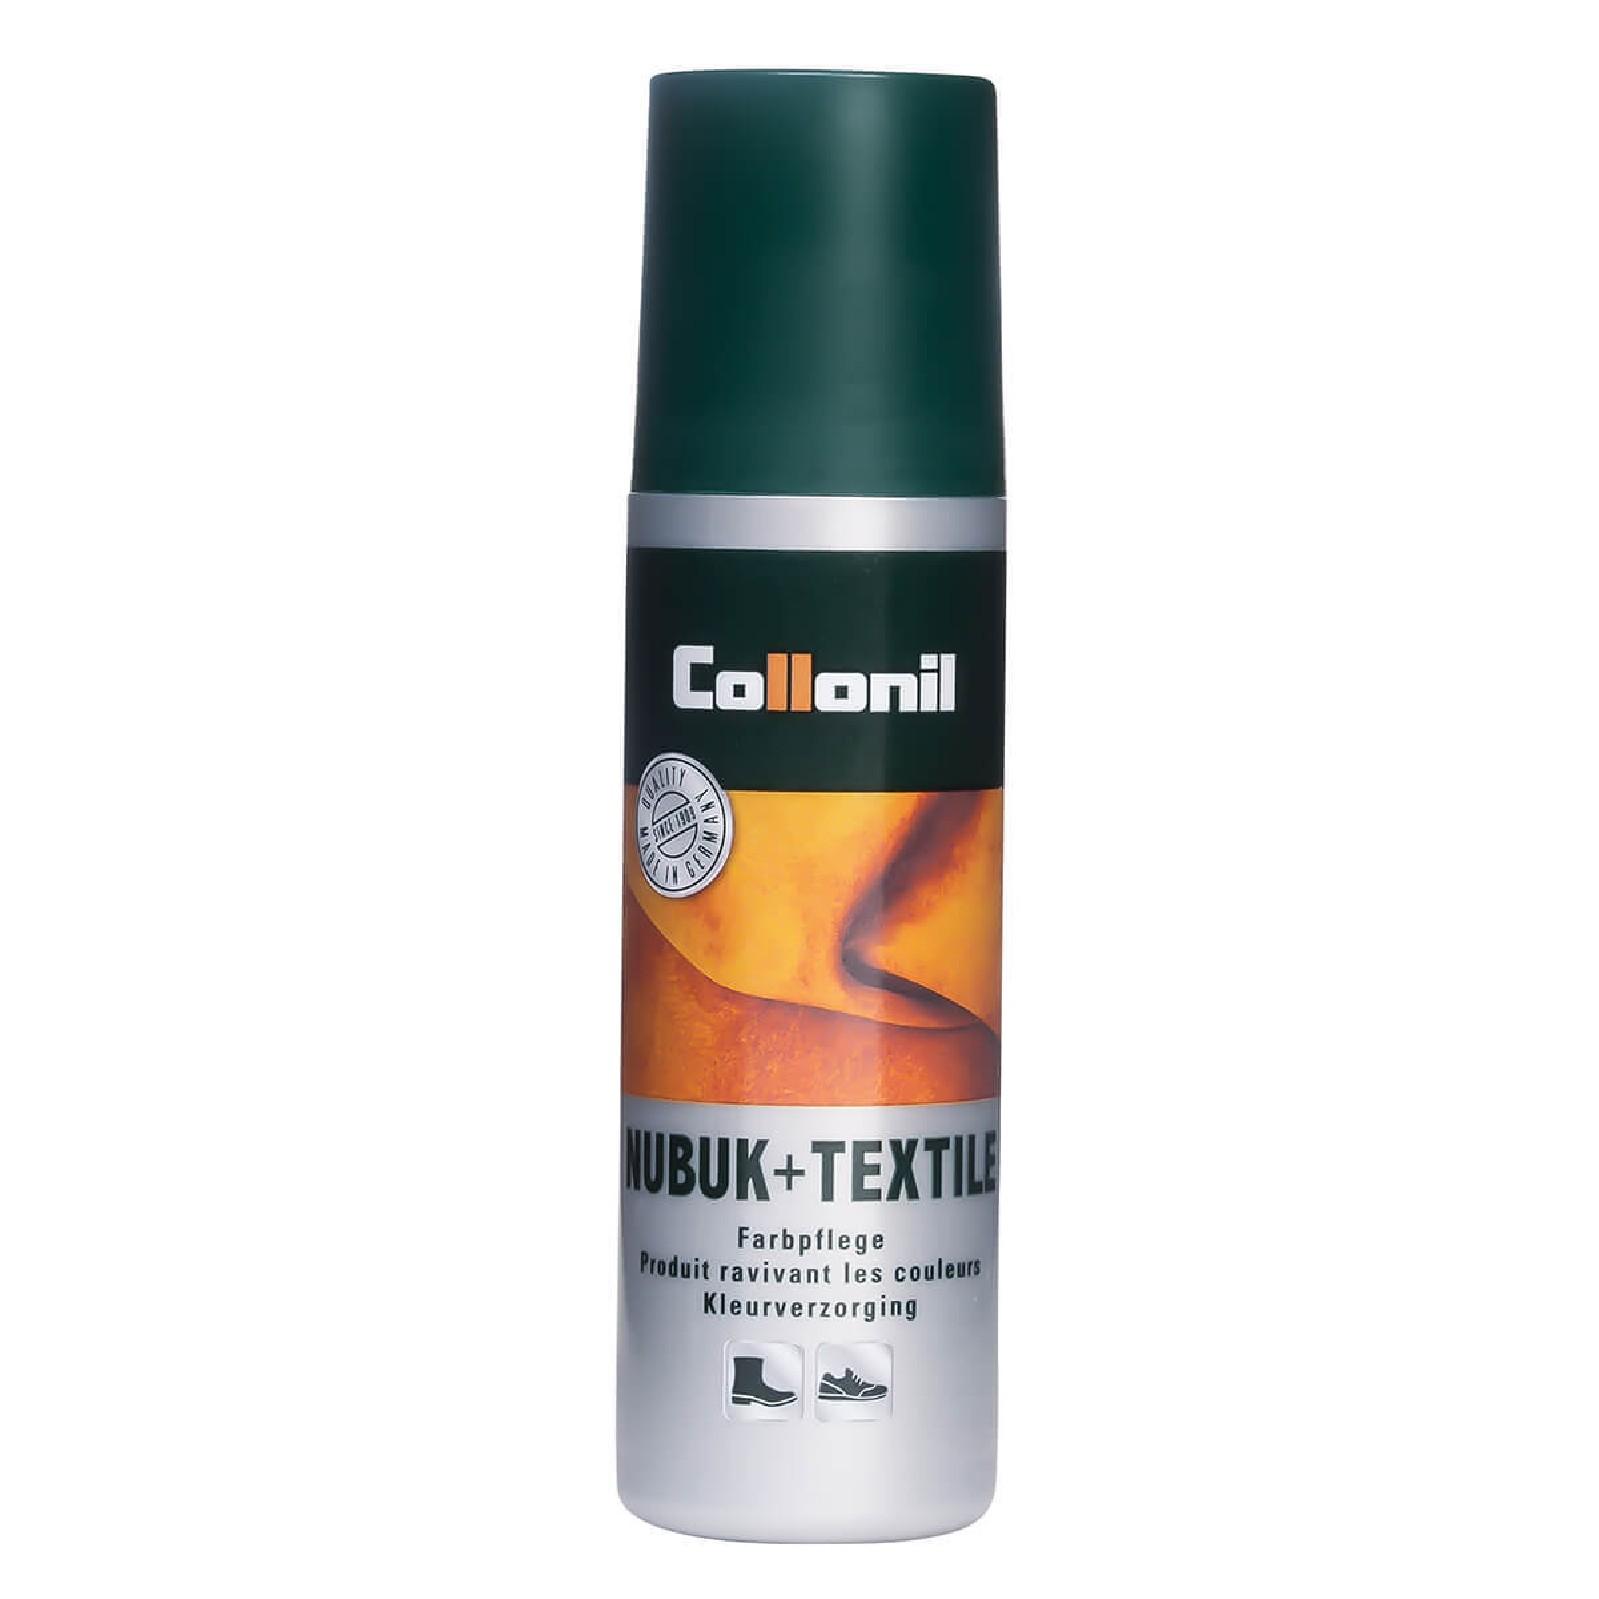 Collonil Nubuk+textil 75 ml karamelový